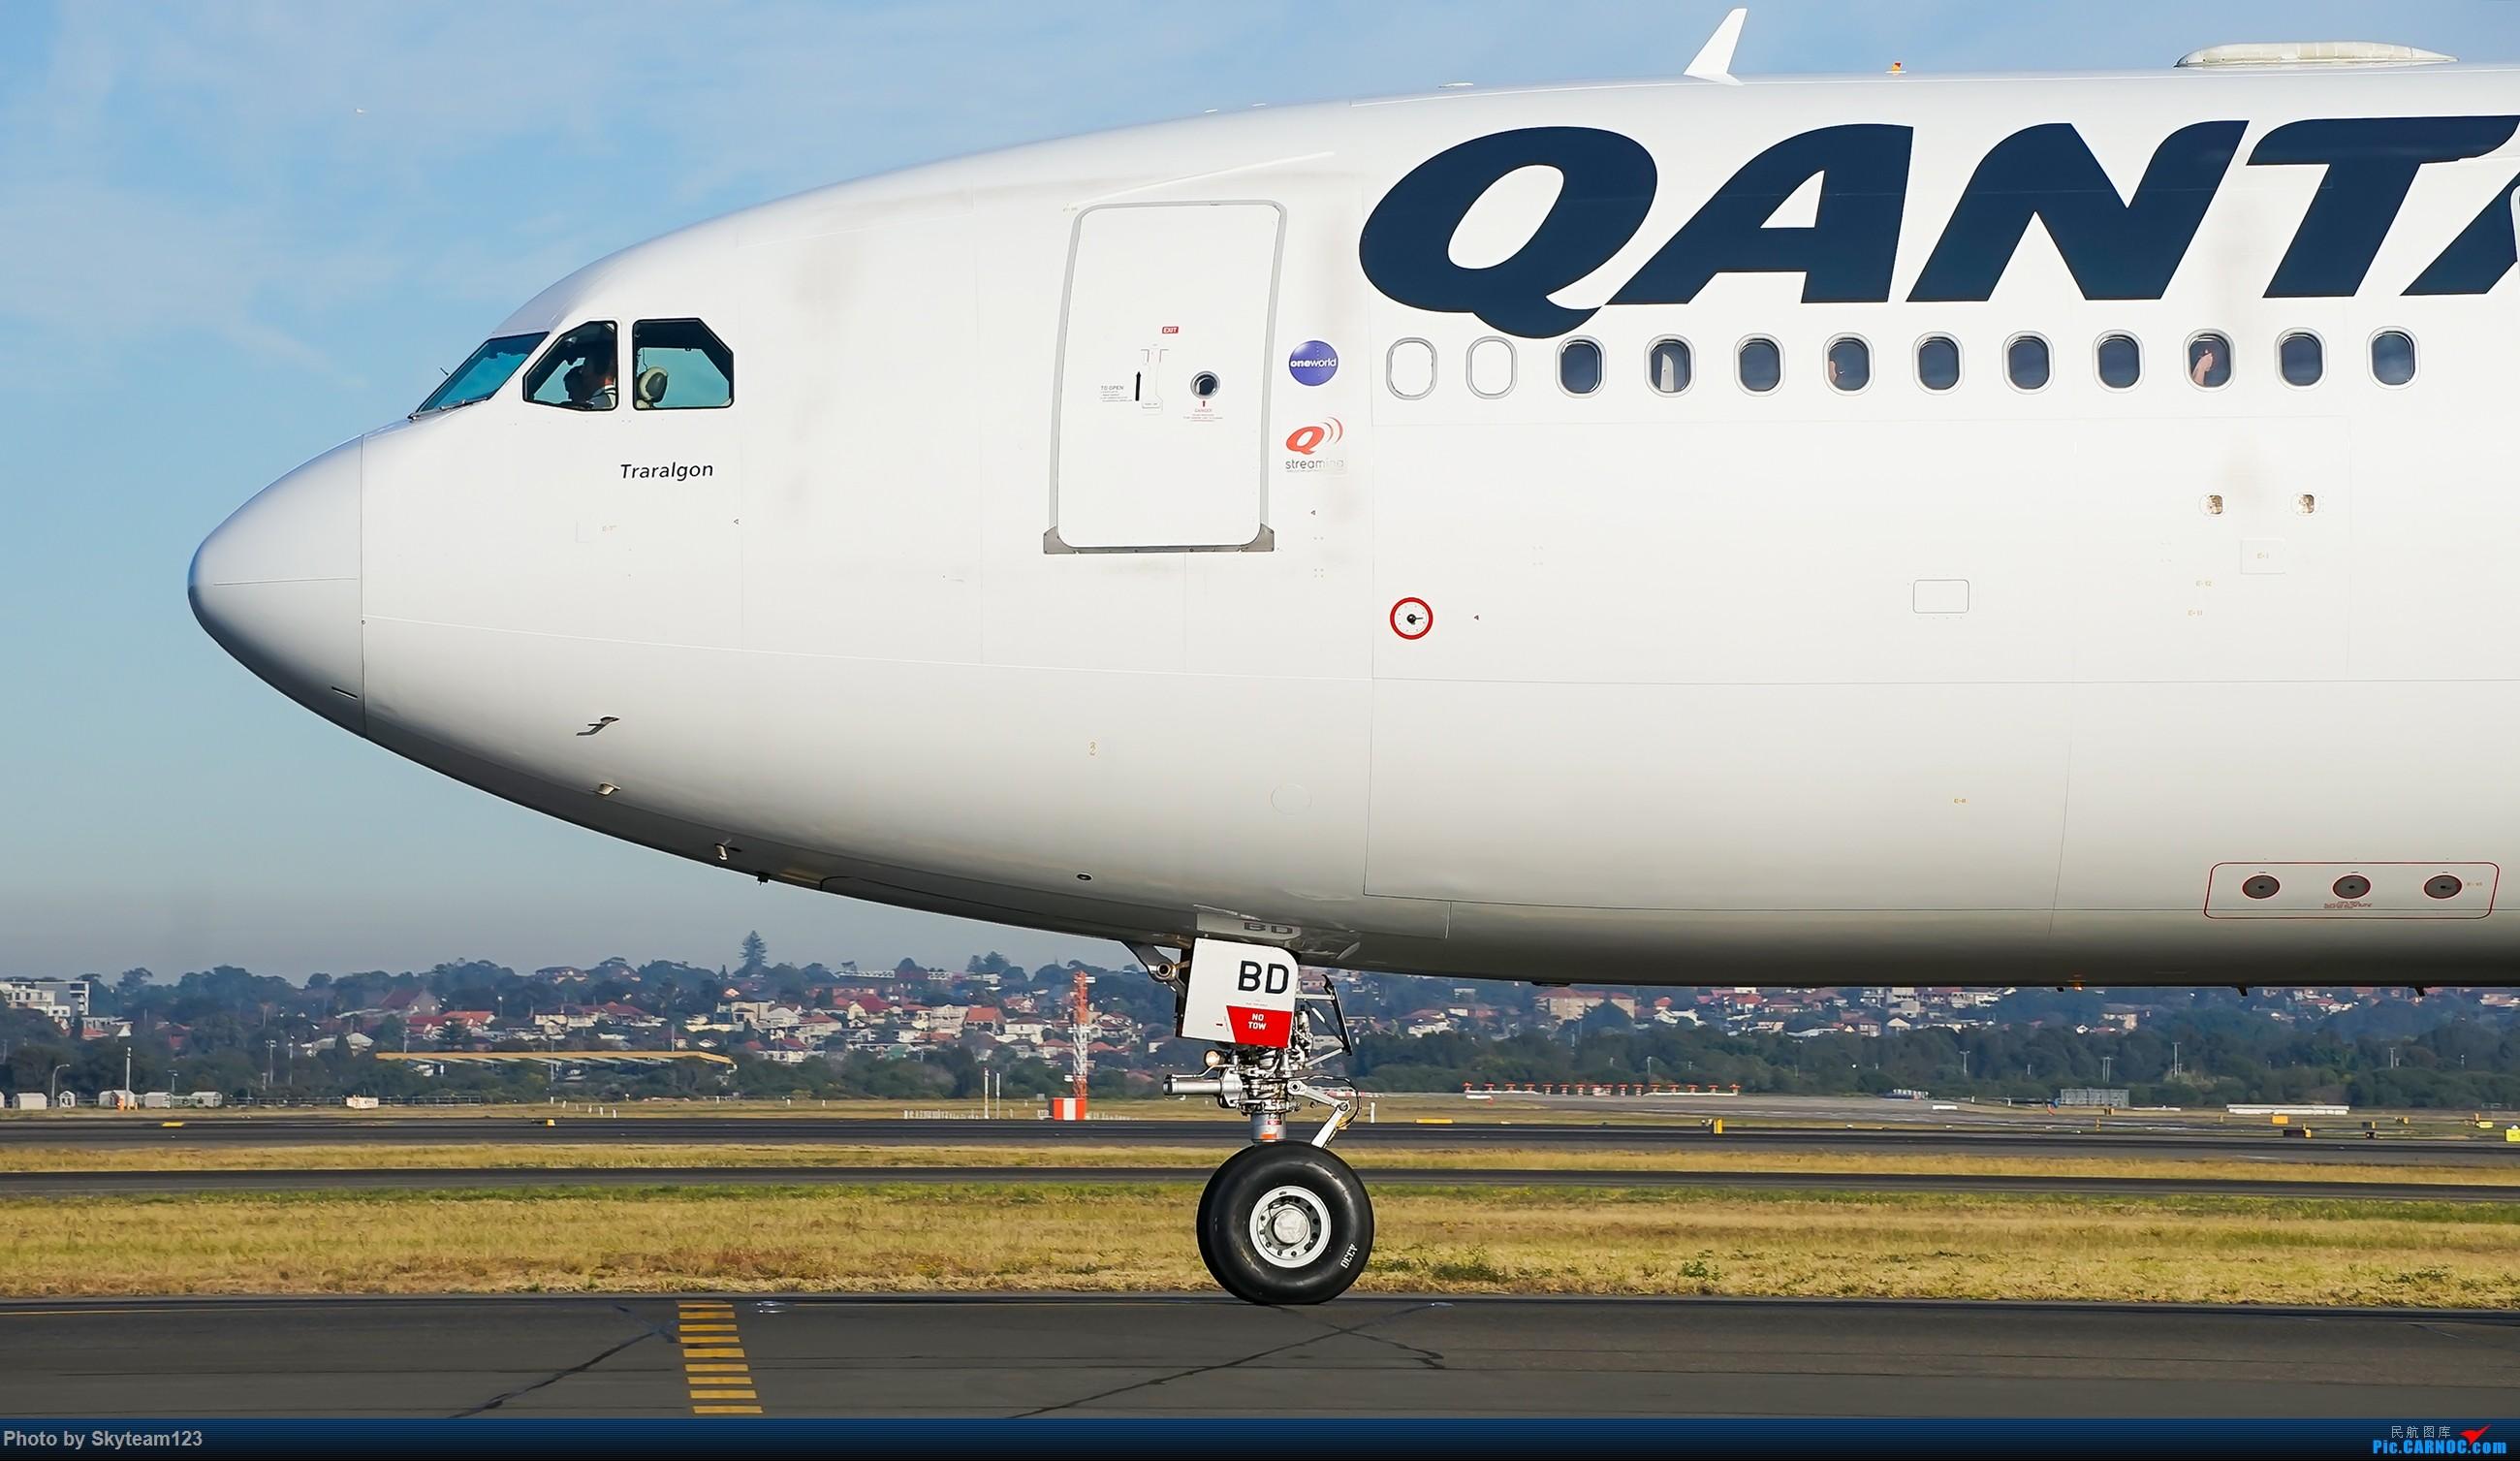 Re:[原创][SYD] 再访Blu EMU停车场 早上34L抵港出发杂图几张 AIRBUS A330-200 VH-EBD 澳大利亚悉尼金斯福德·史密斯机场